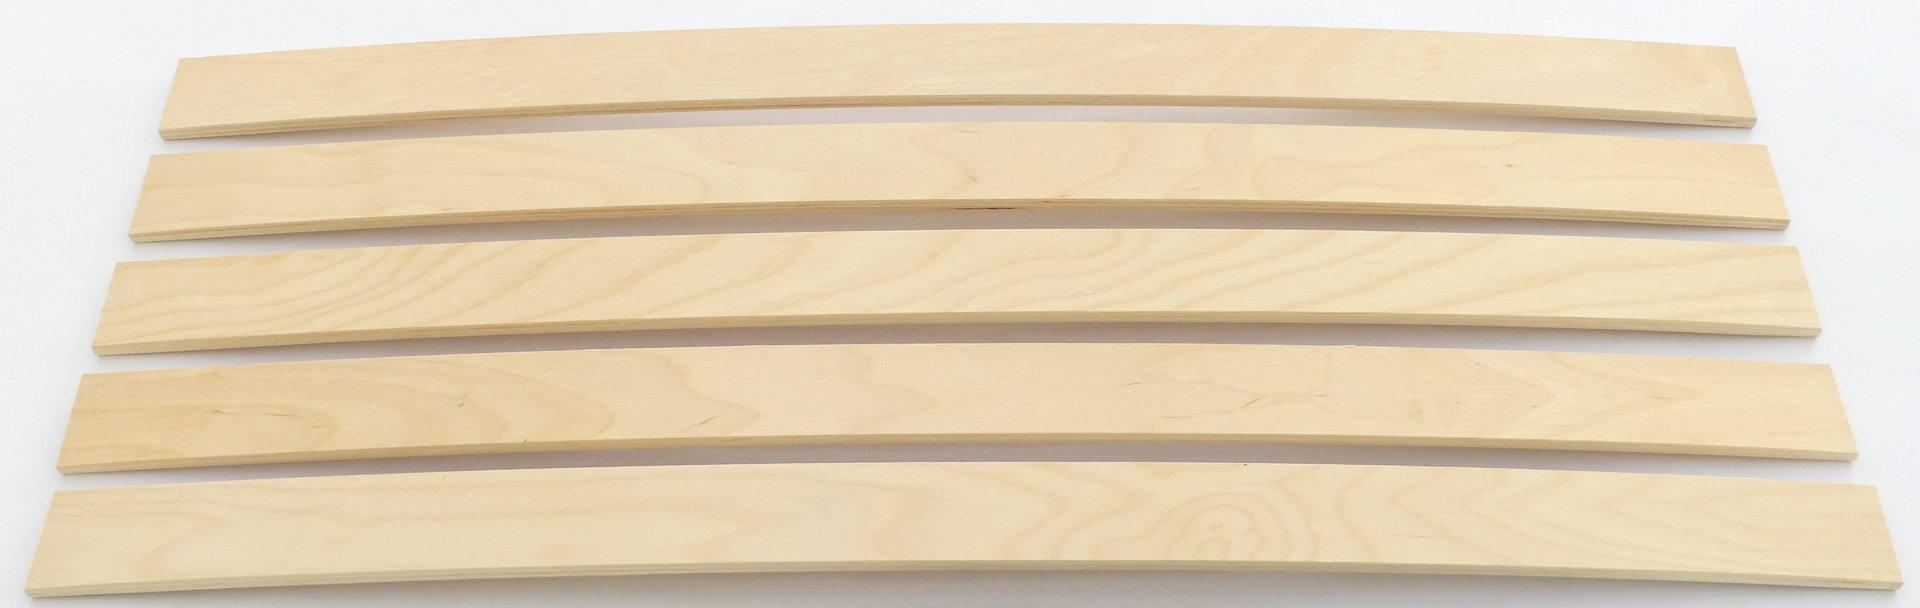 federholzleisten 5er paket 12mm st rke fachhandel f r lattenrostersatzteile. Black Bedroom Furniture Sets. Home Design Ideas